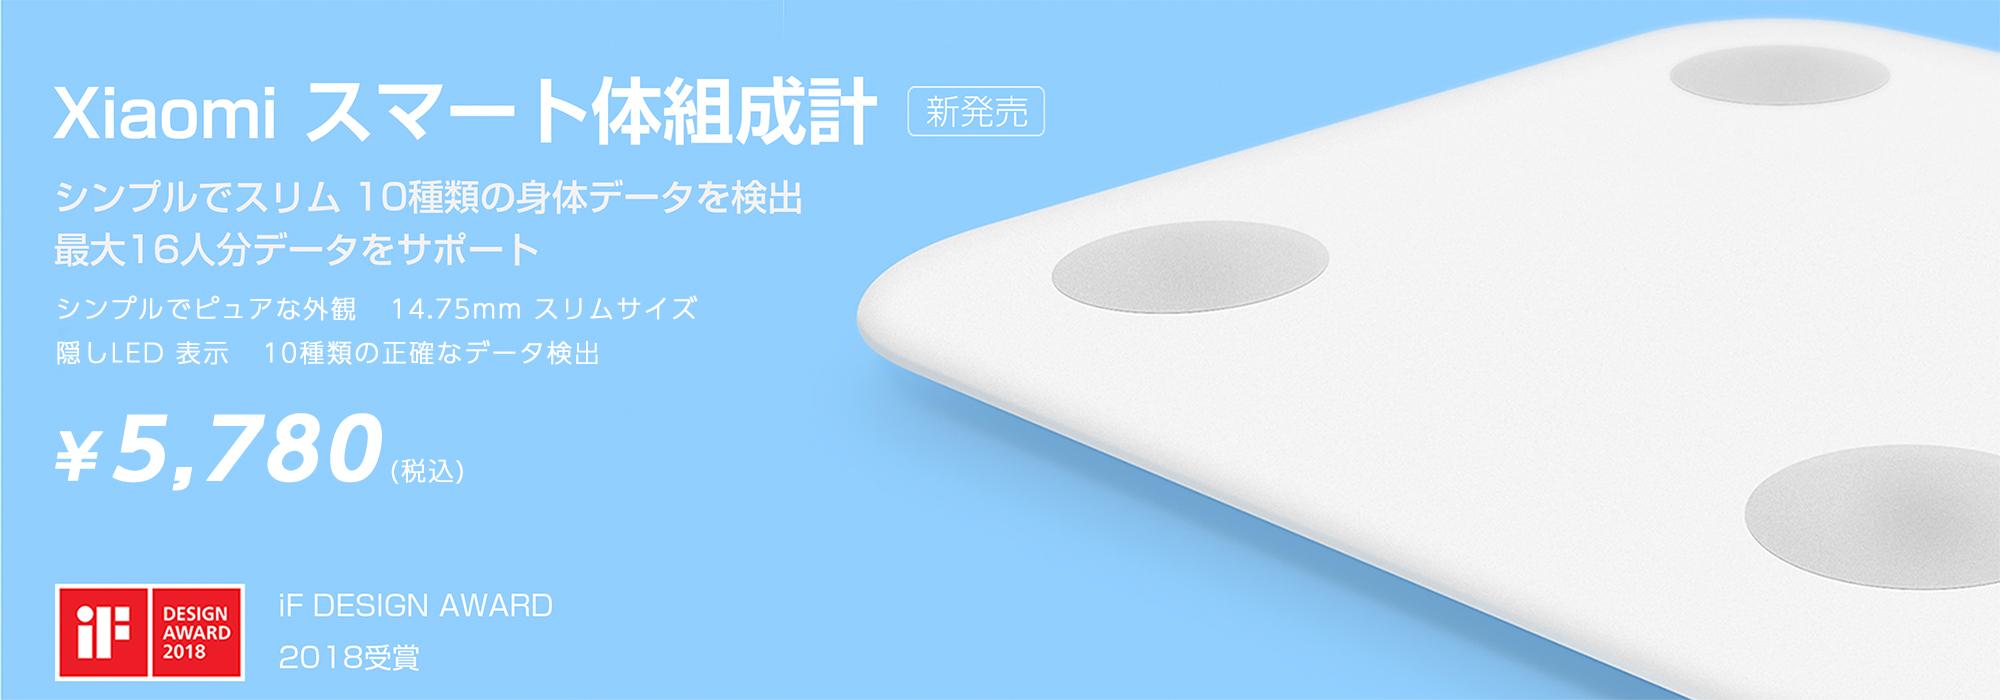 Xiaomi スマート体組織計